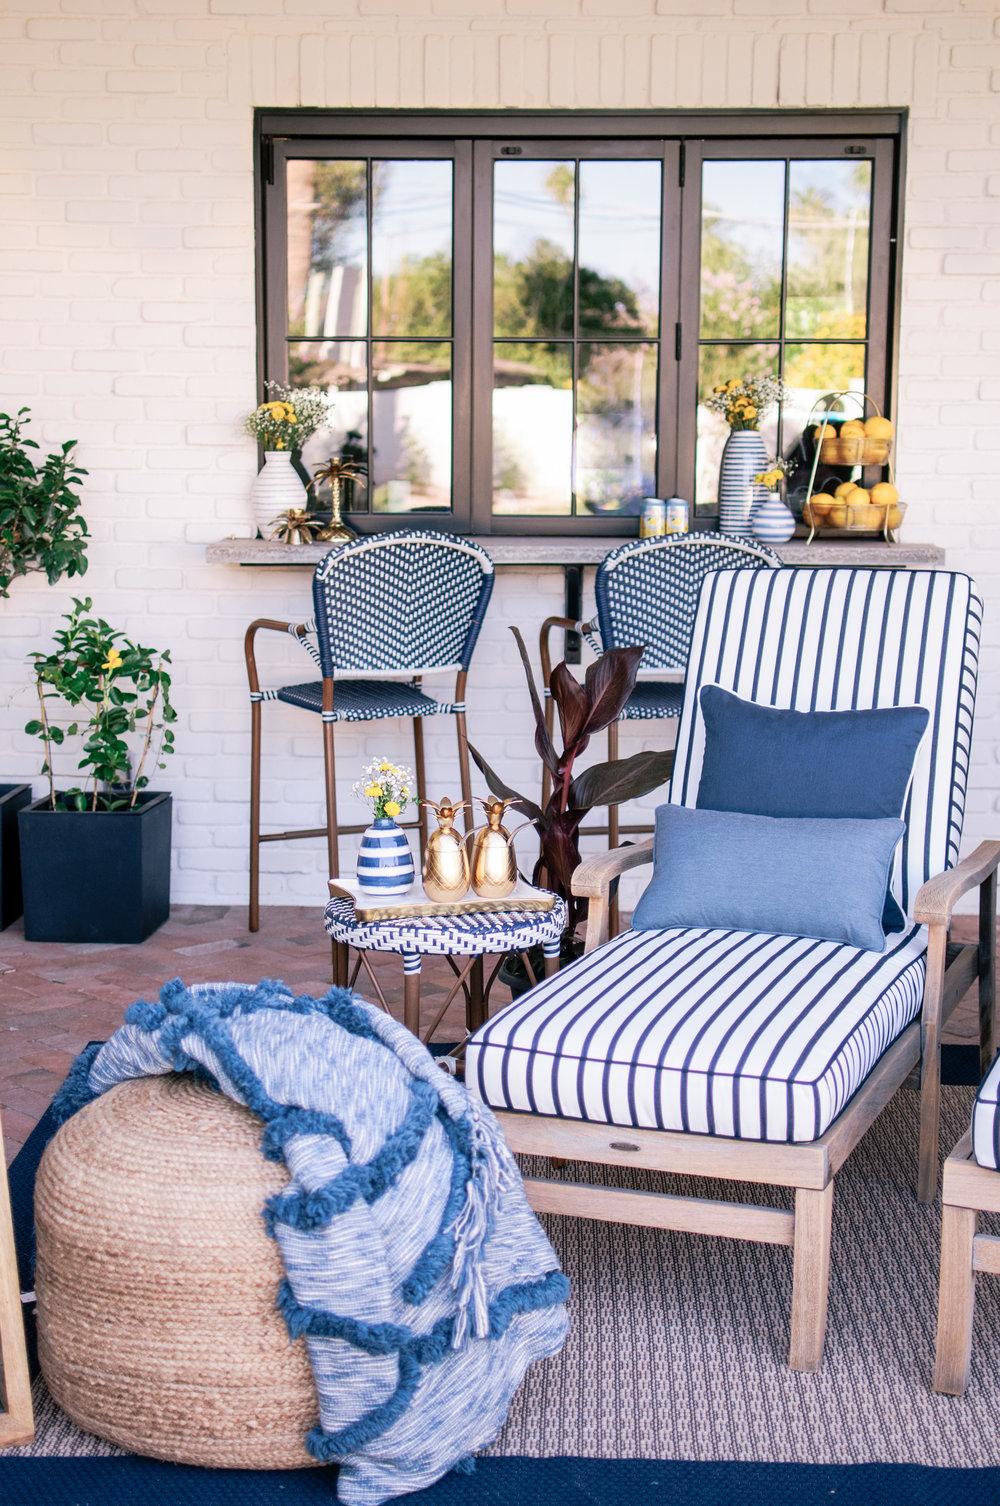 A Dream Outdoor Backyard Patio Oasis on a Budget